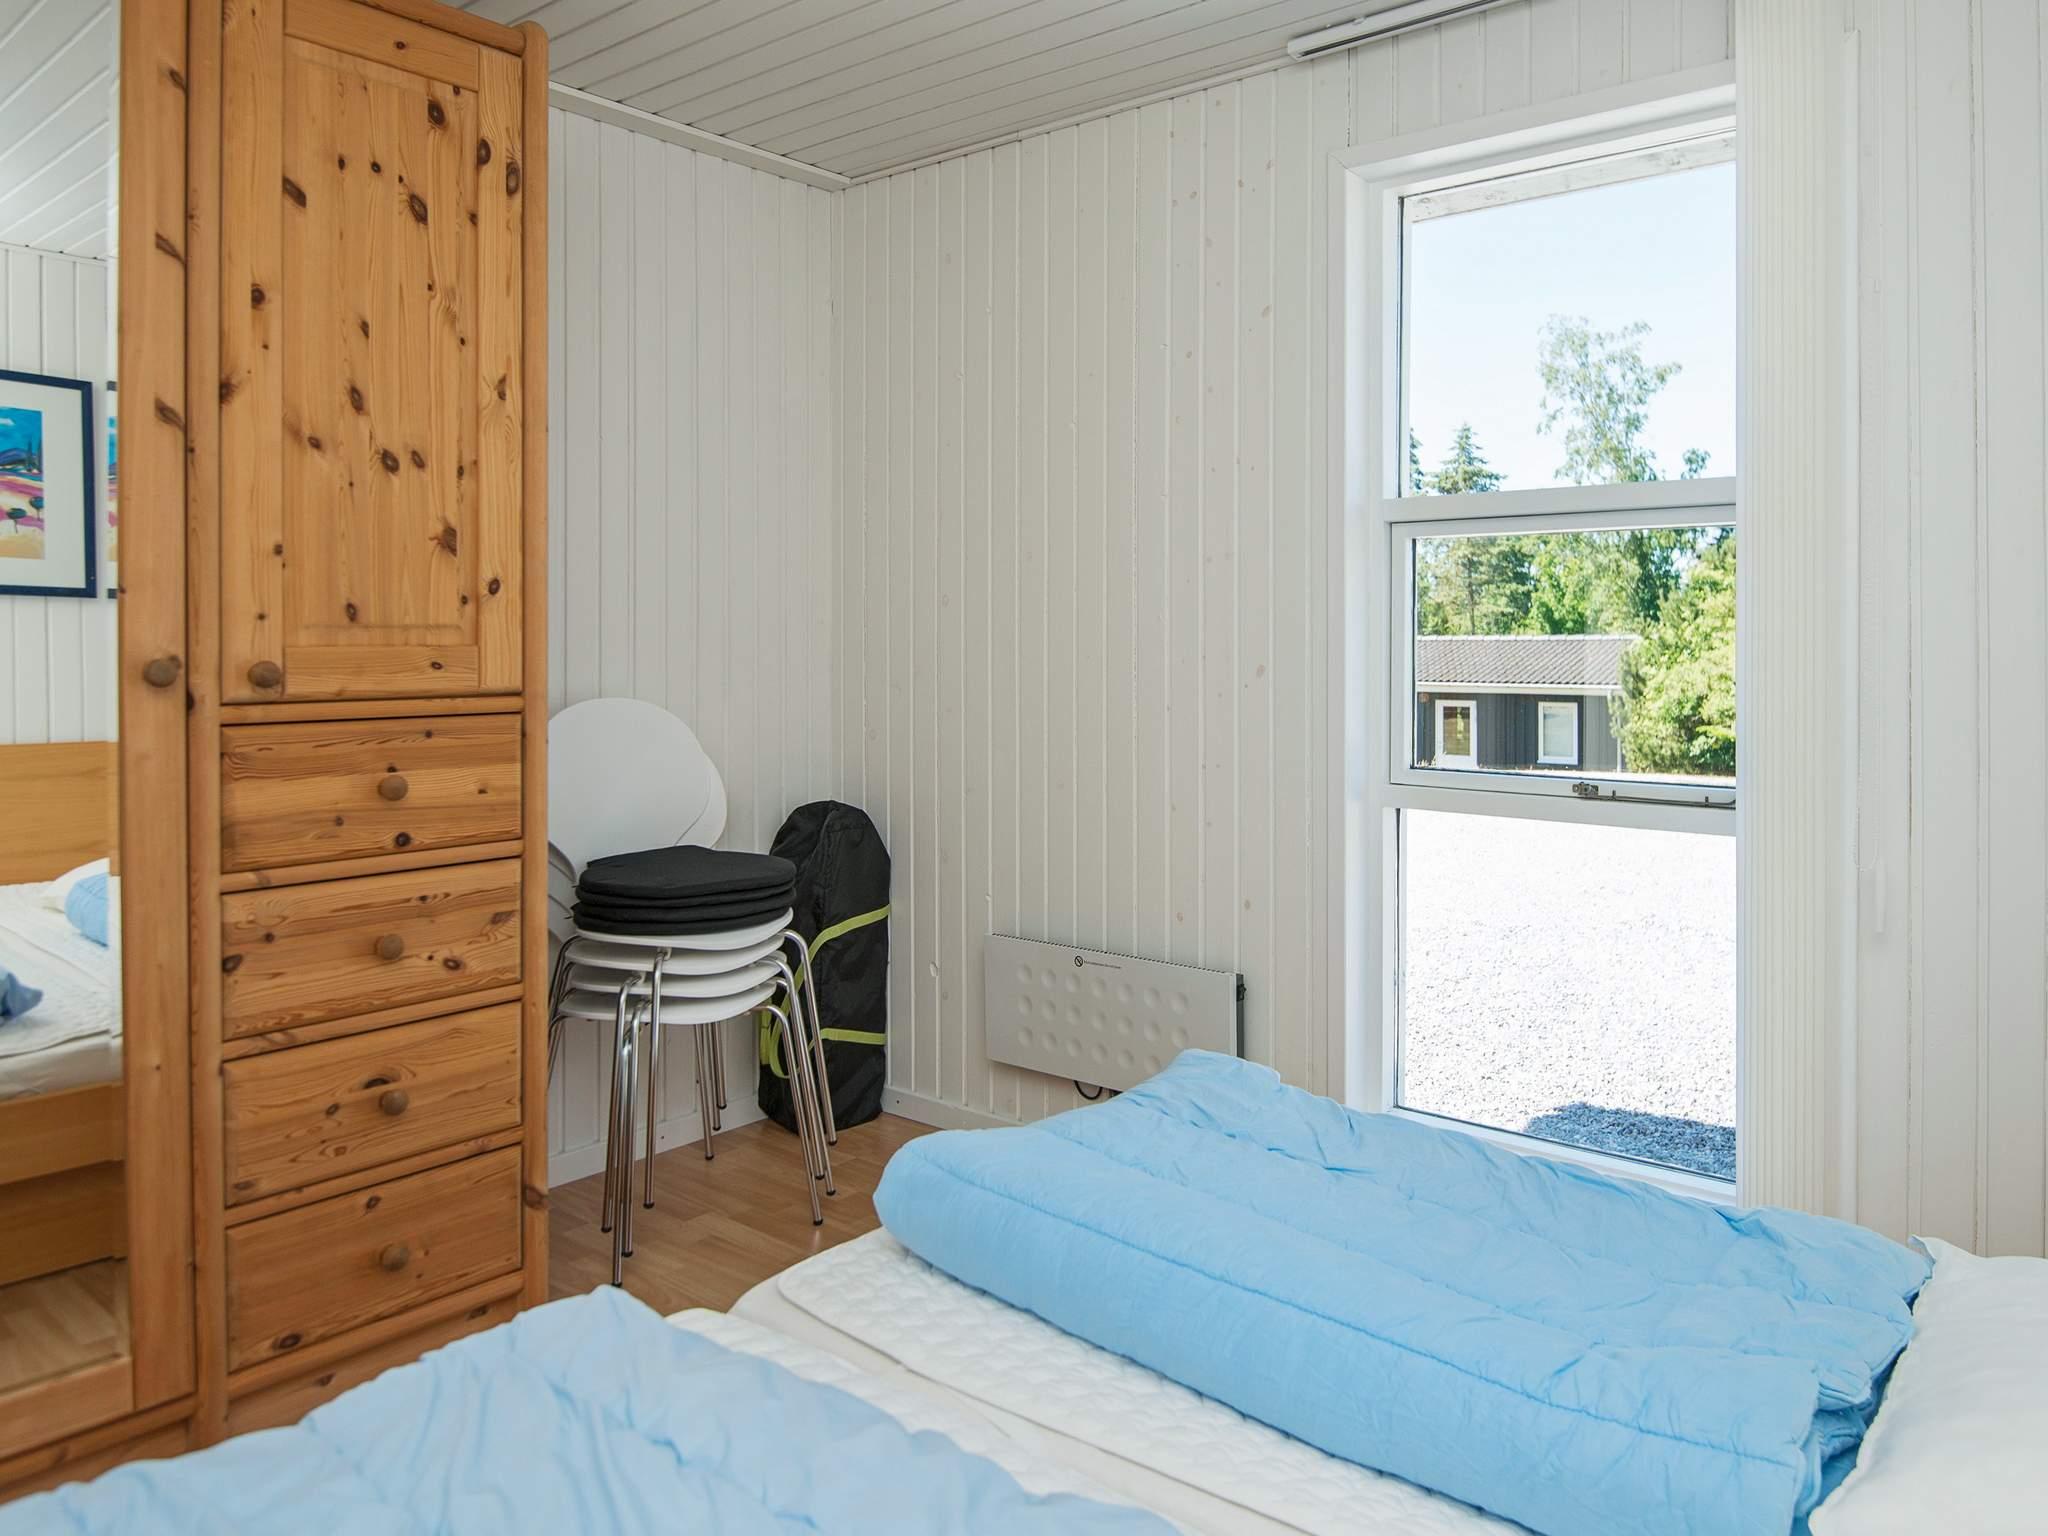 Maison de vacances Helgenæs (978615), Knebel, , Jutland Est, Danemark, image 7